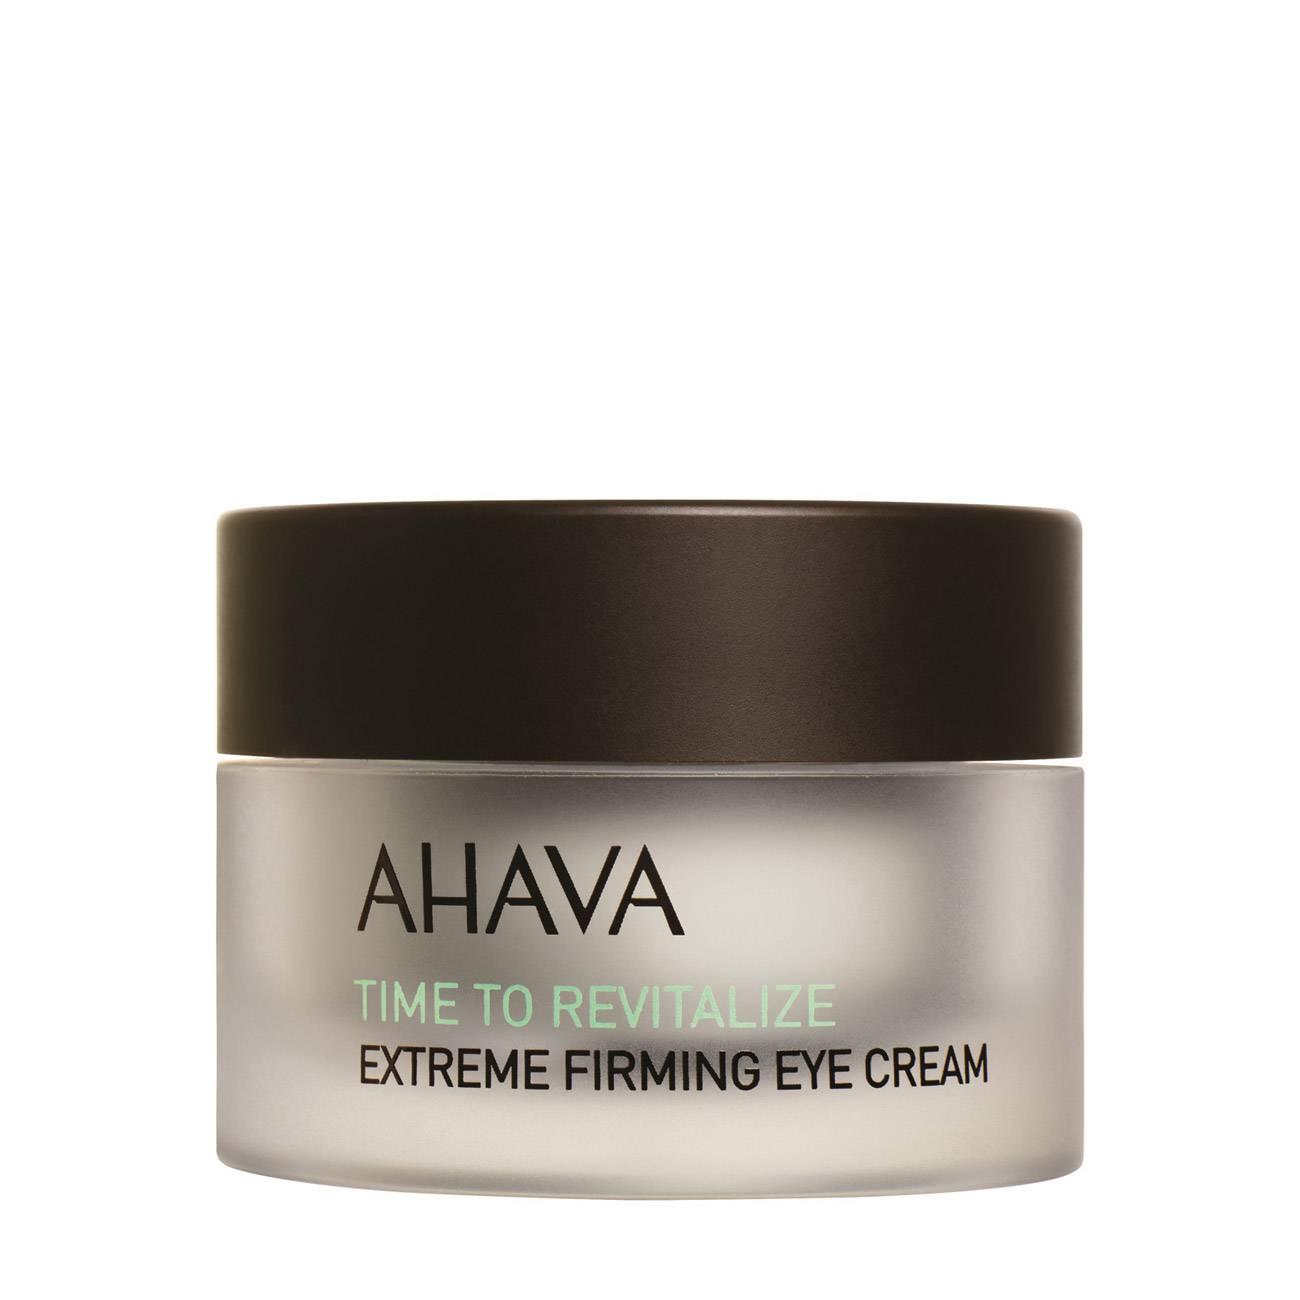 Time To Revitalize Extreme Firming Eye Cream 15 Ml Ahava imagine 2021 bestvalue.eu